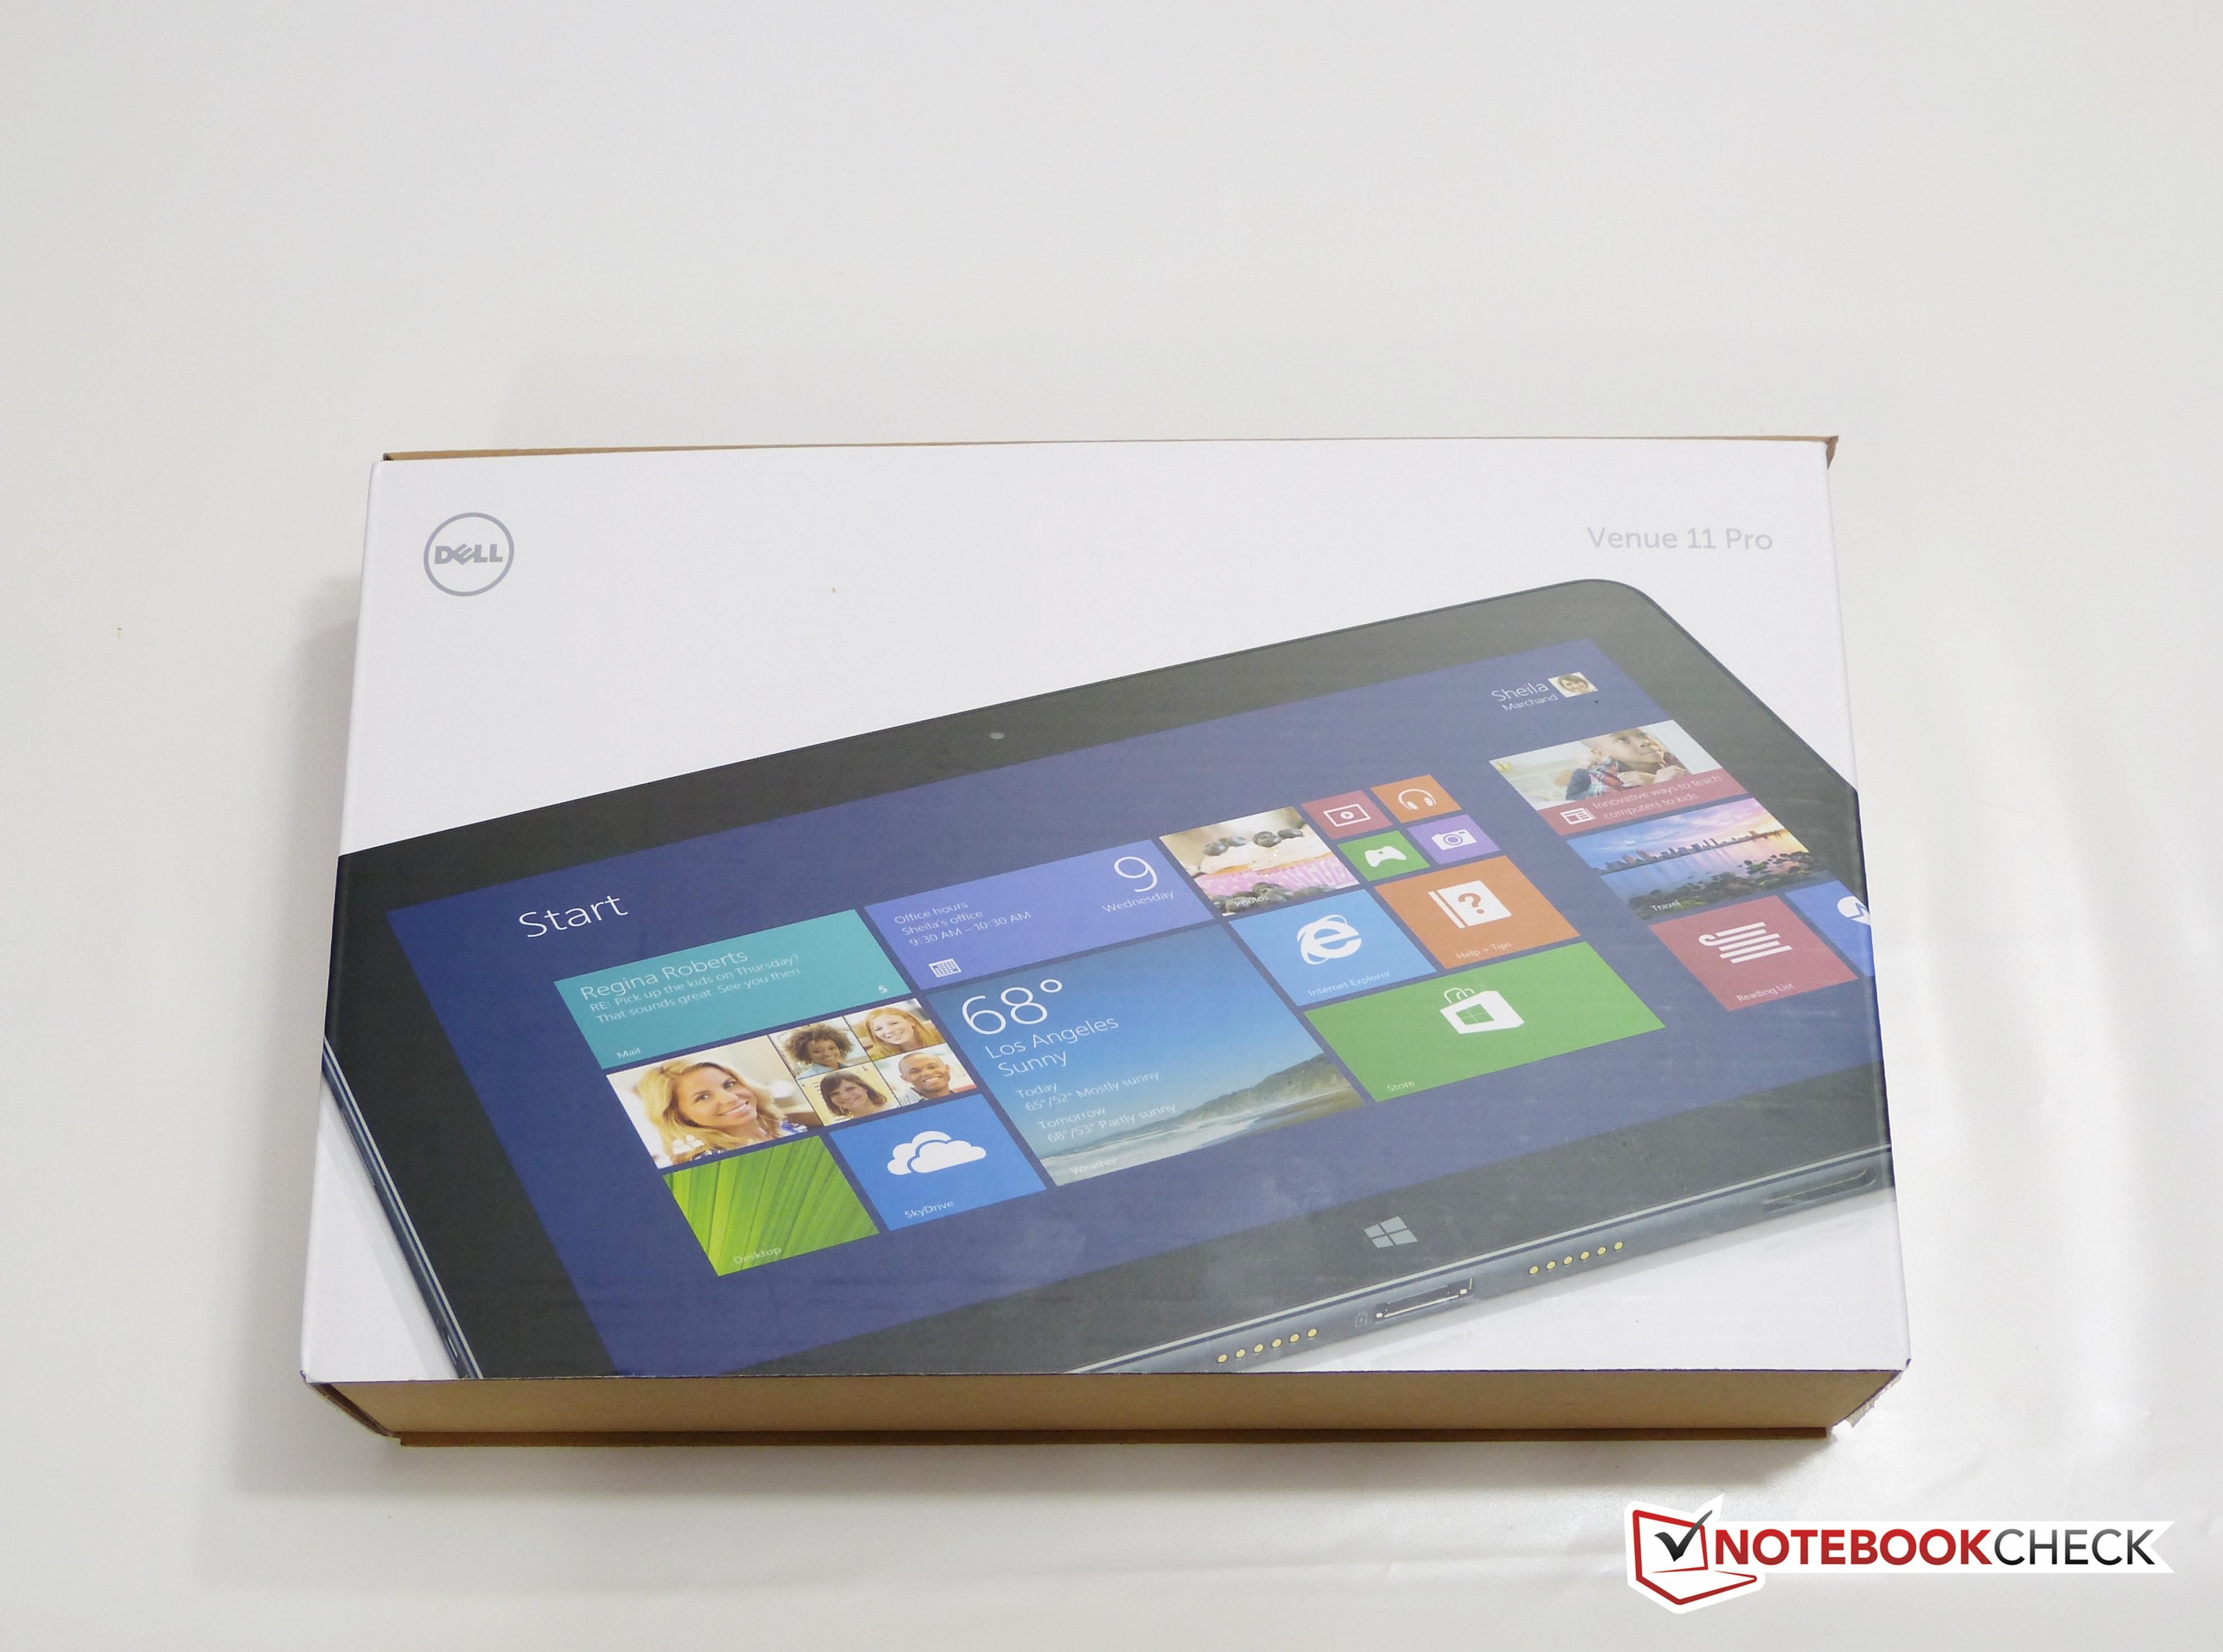 Kort testrapport dell venue 11 pro 5130 9356 tablet notebookcheck.nl